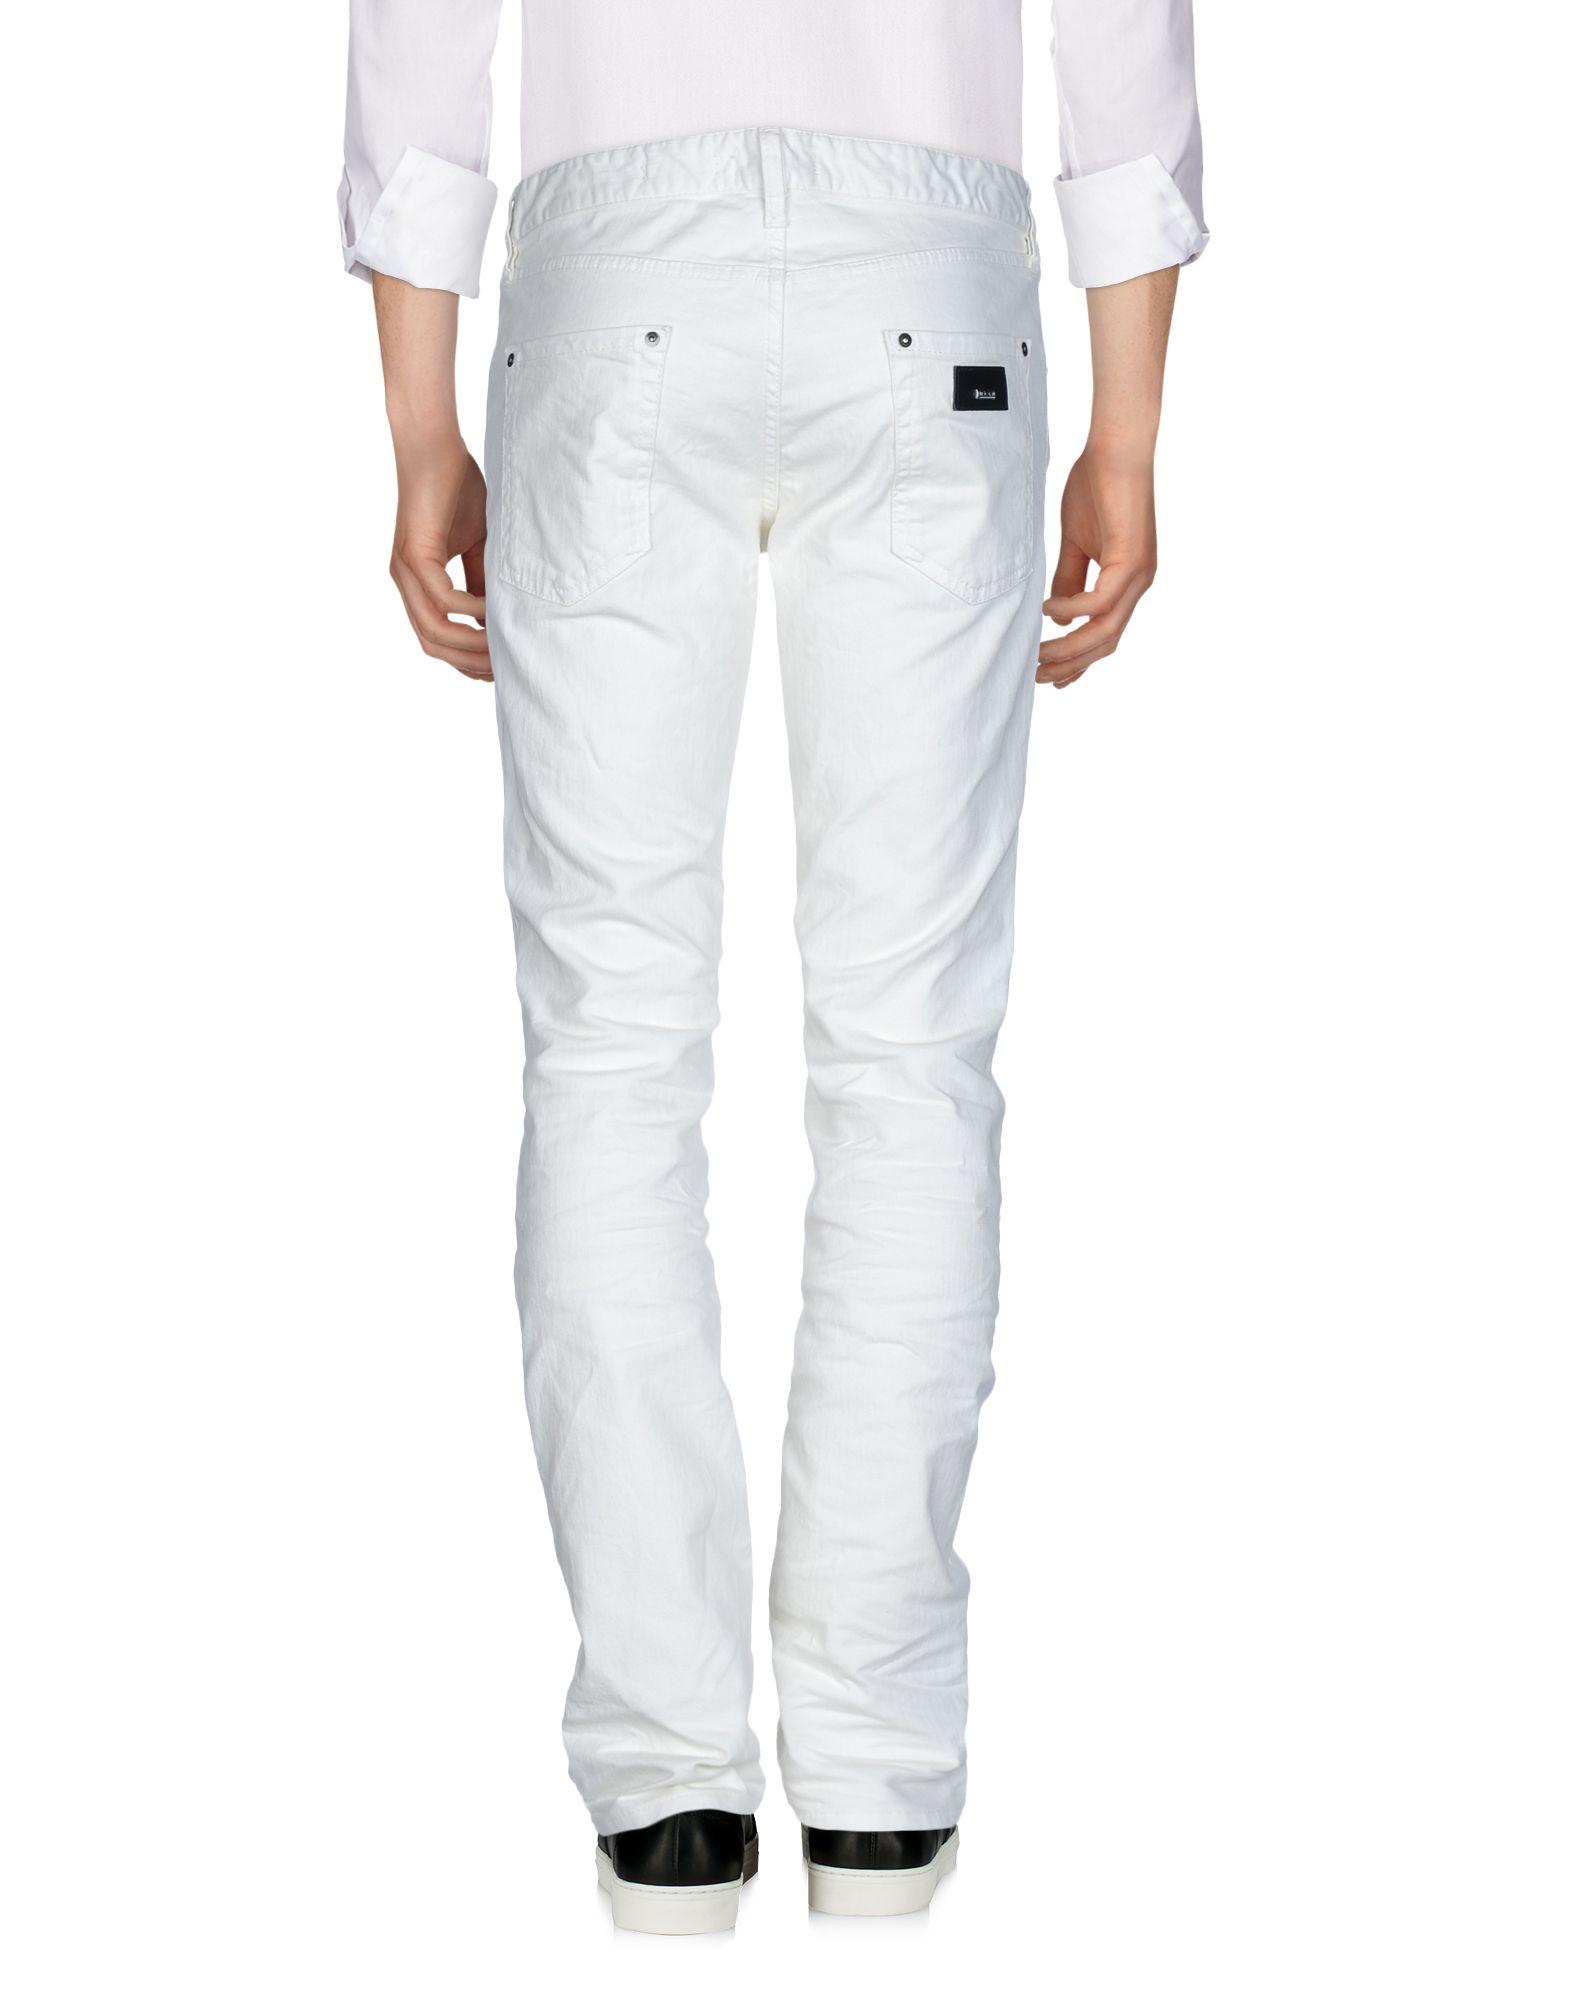 Pantaloni Jeans Just 42627358VH Cavalli Uomo - 42627358VH Just 036b66